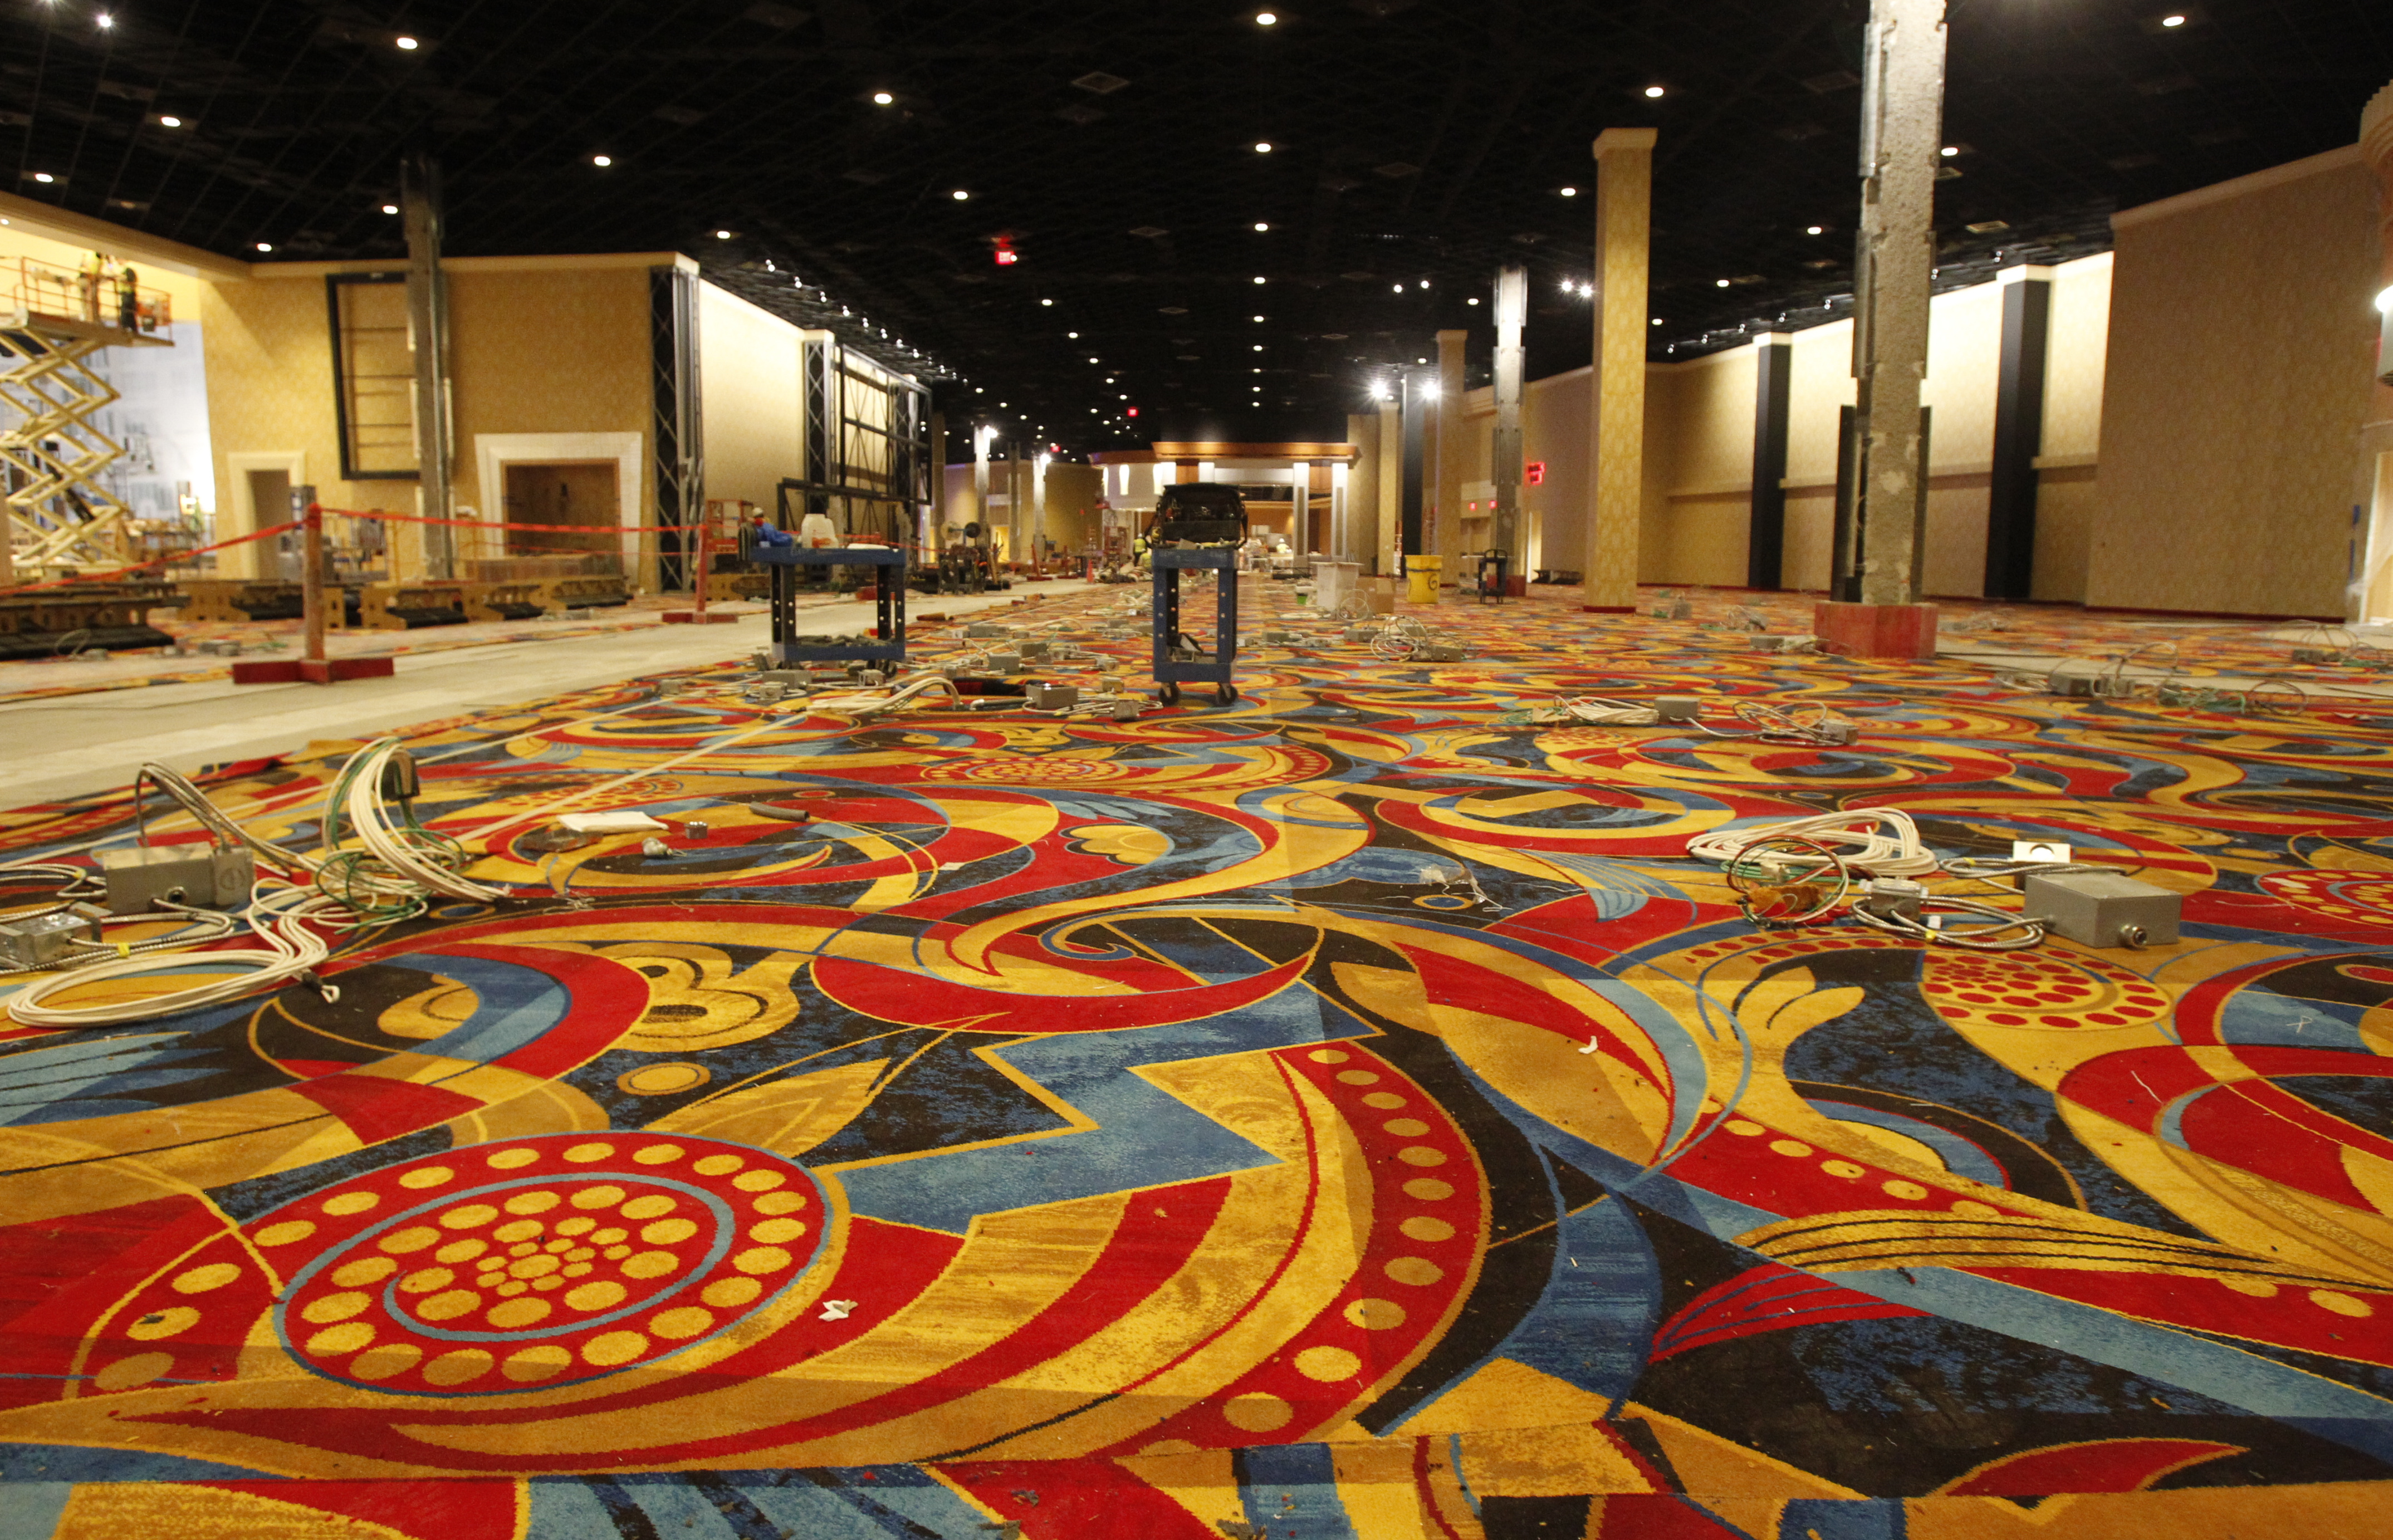 Media Get Peek At Toledo Casino The Blade